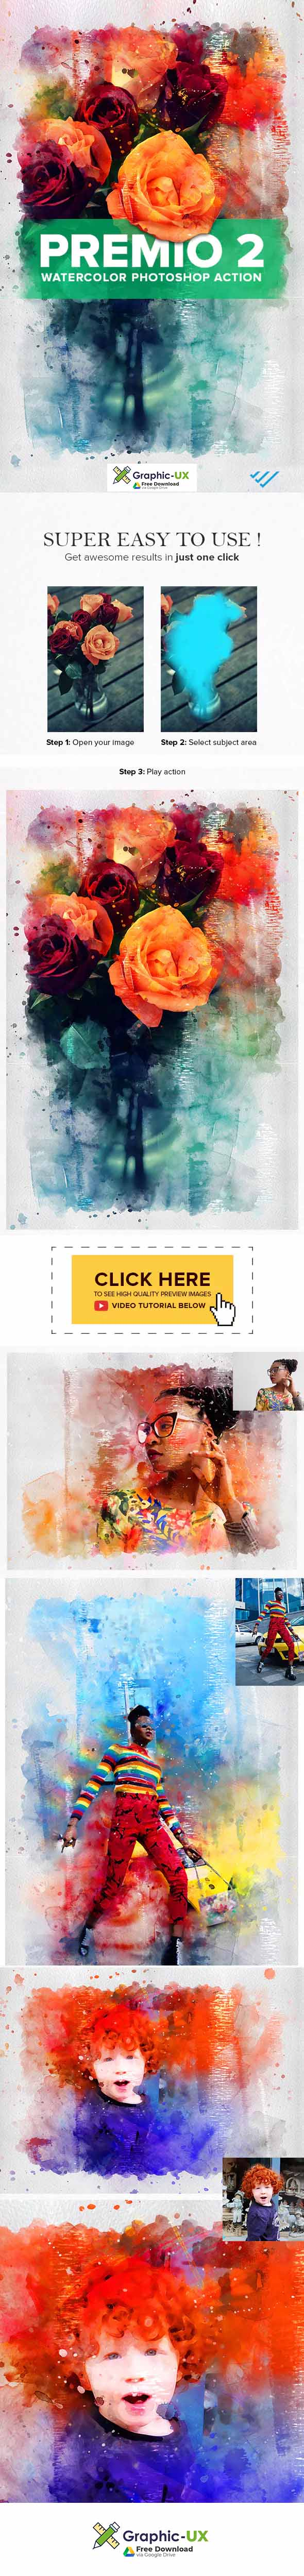 Premio 2 Watercolor Photoshop Action free – GraphicUX